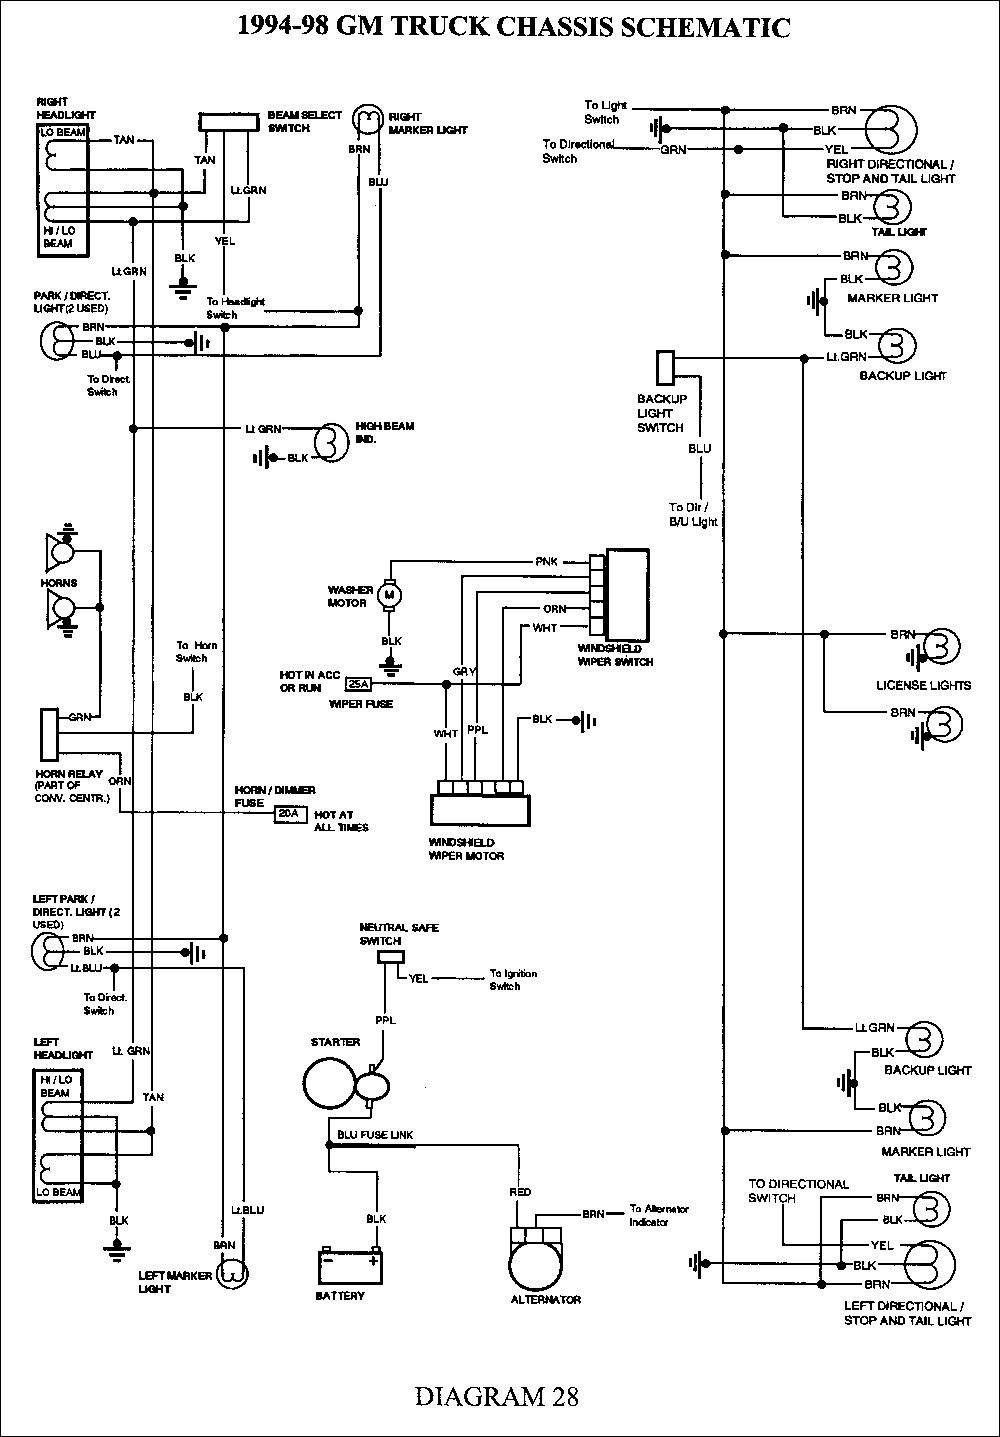 2006 Chevy Tail Light Wiring Diagram | Wiring Diagram - 2006 Chevy Silverado Tail Light Wiring Diagram